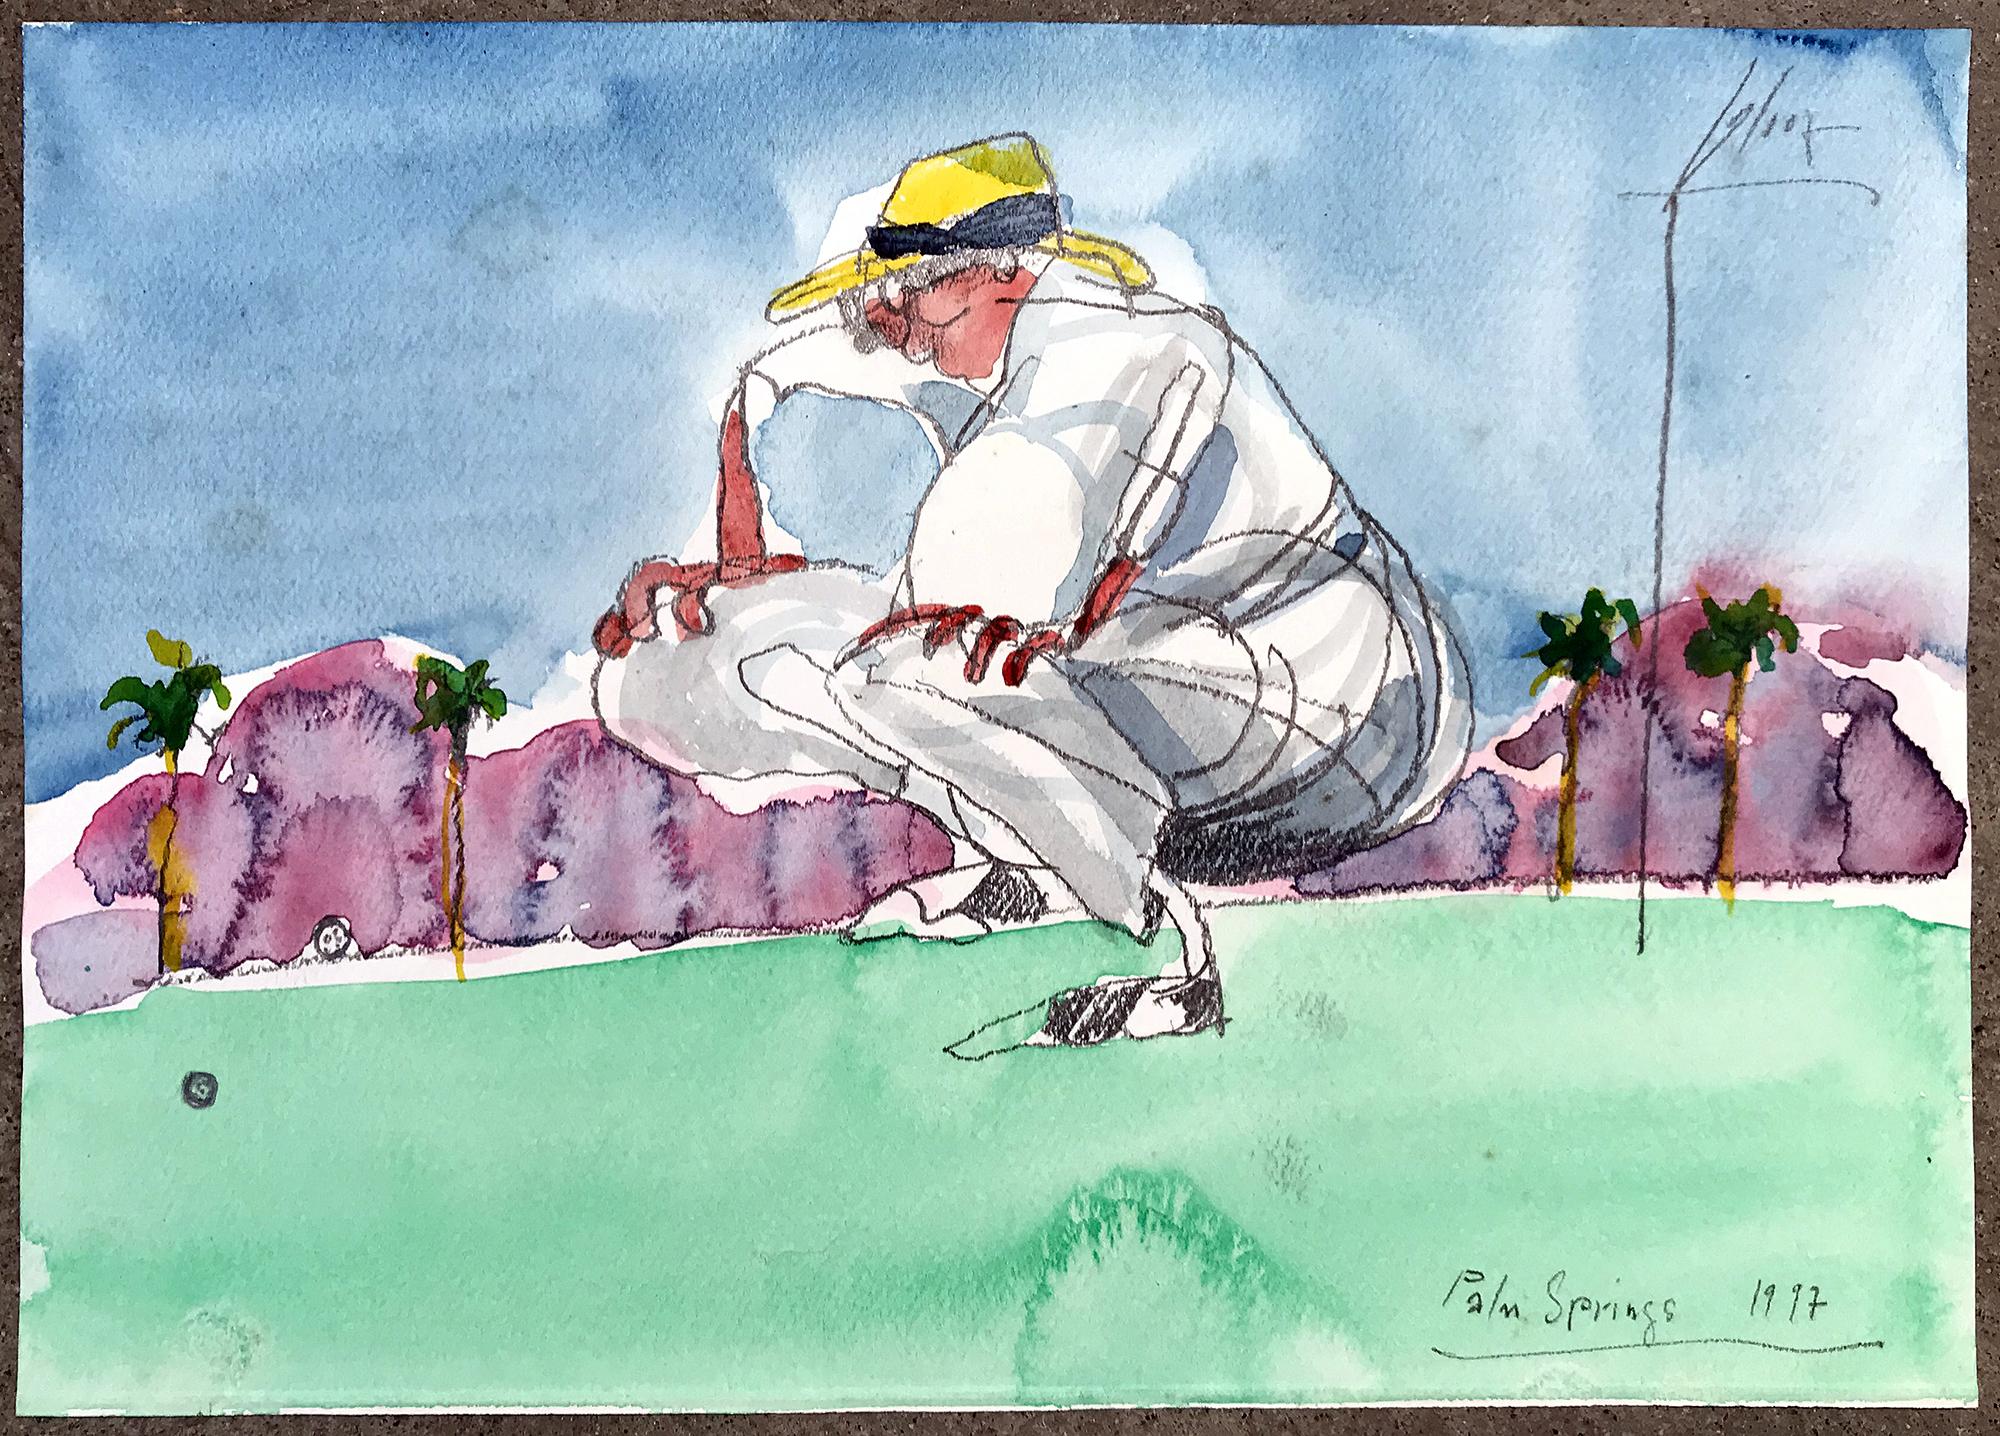 Palm Springs, 1997, Aquarell auf Zeichenpapier, 29 x 21 cm, ohne Rahmen